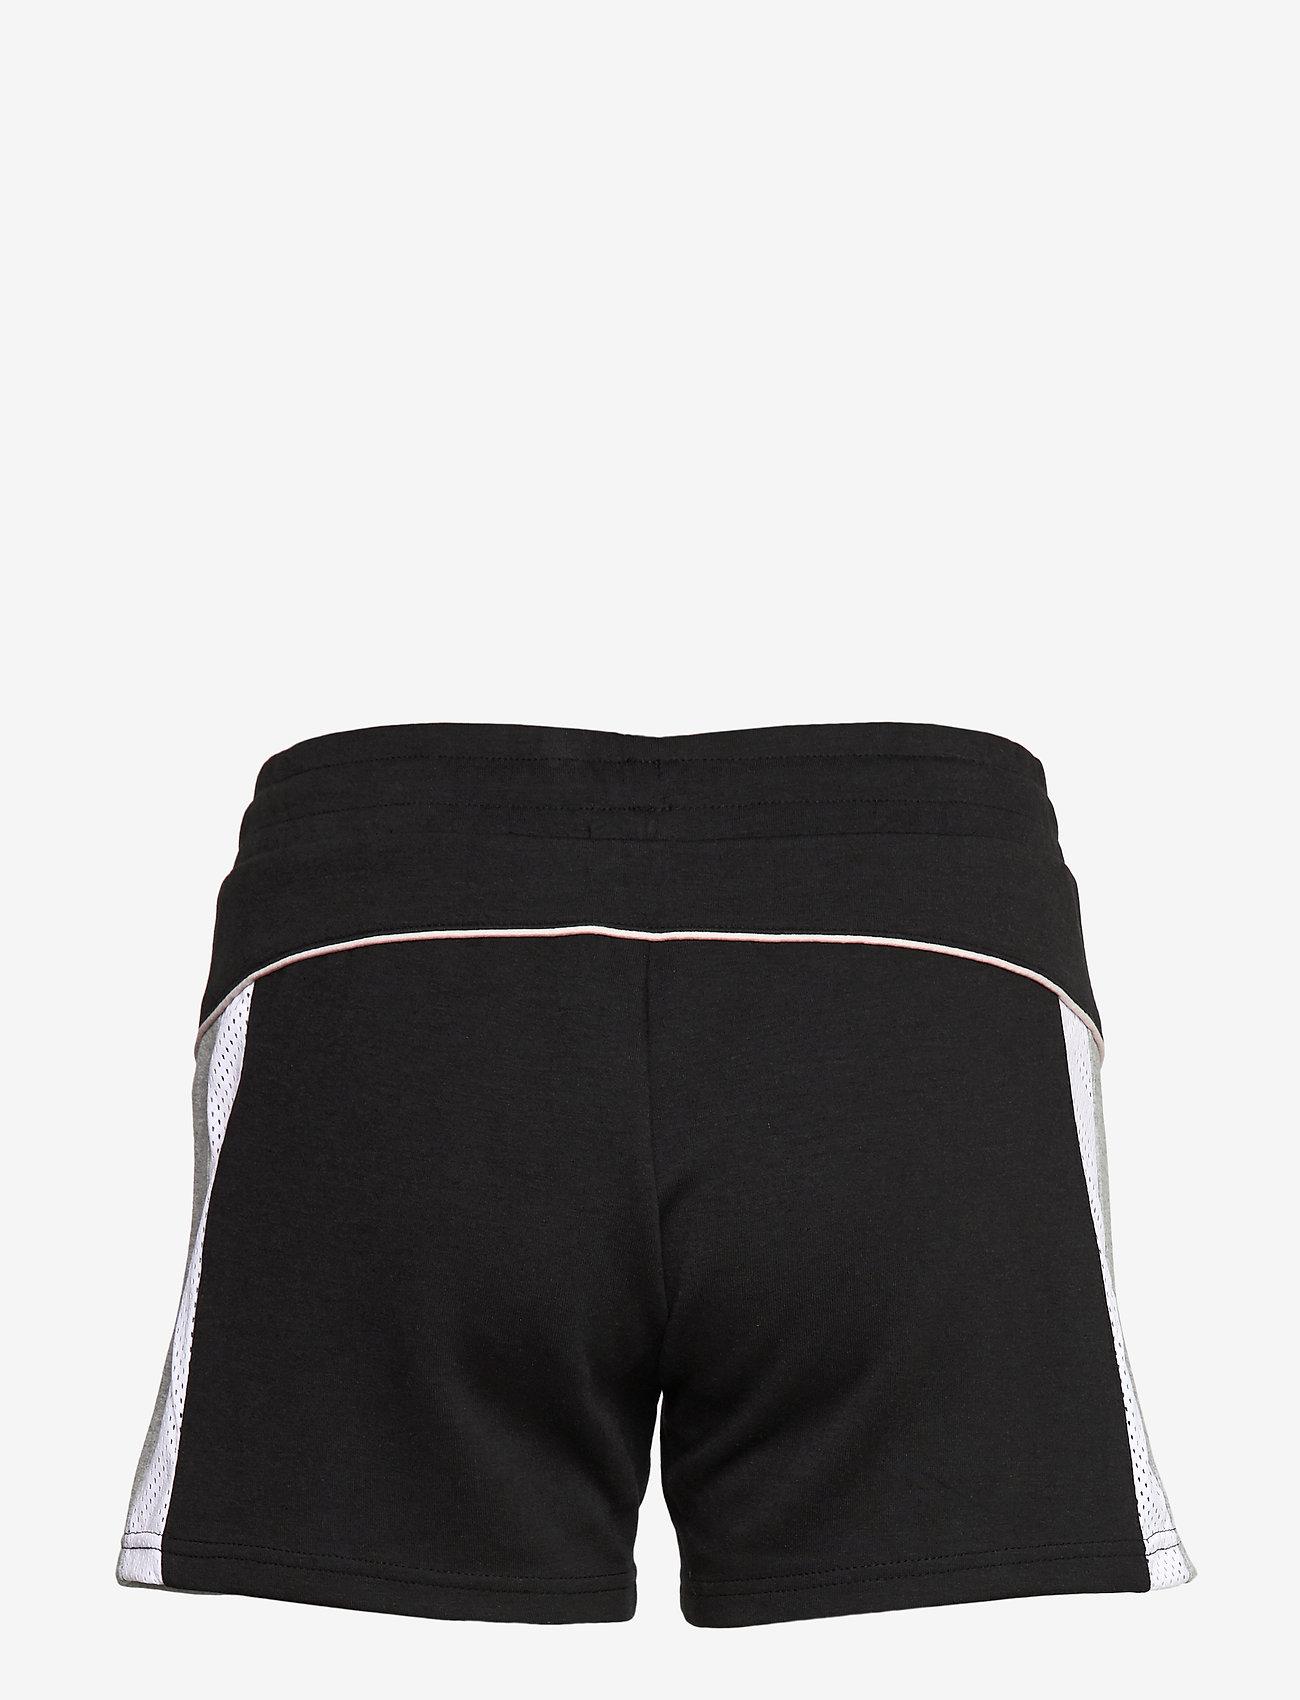 Hummel - hmlNIRVANA SHORTS - training shorts - black - 1